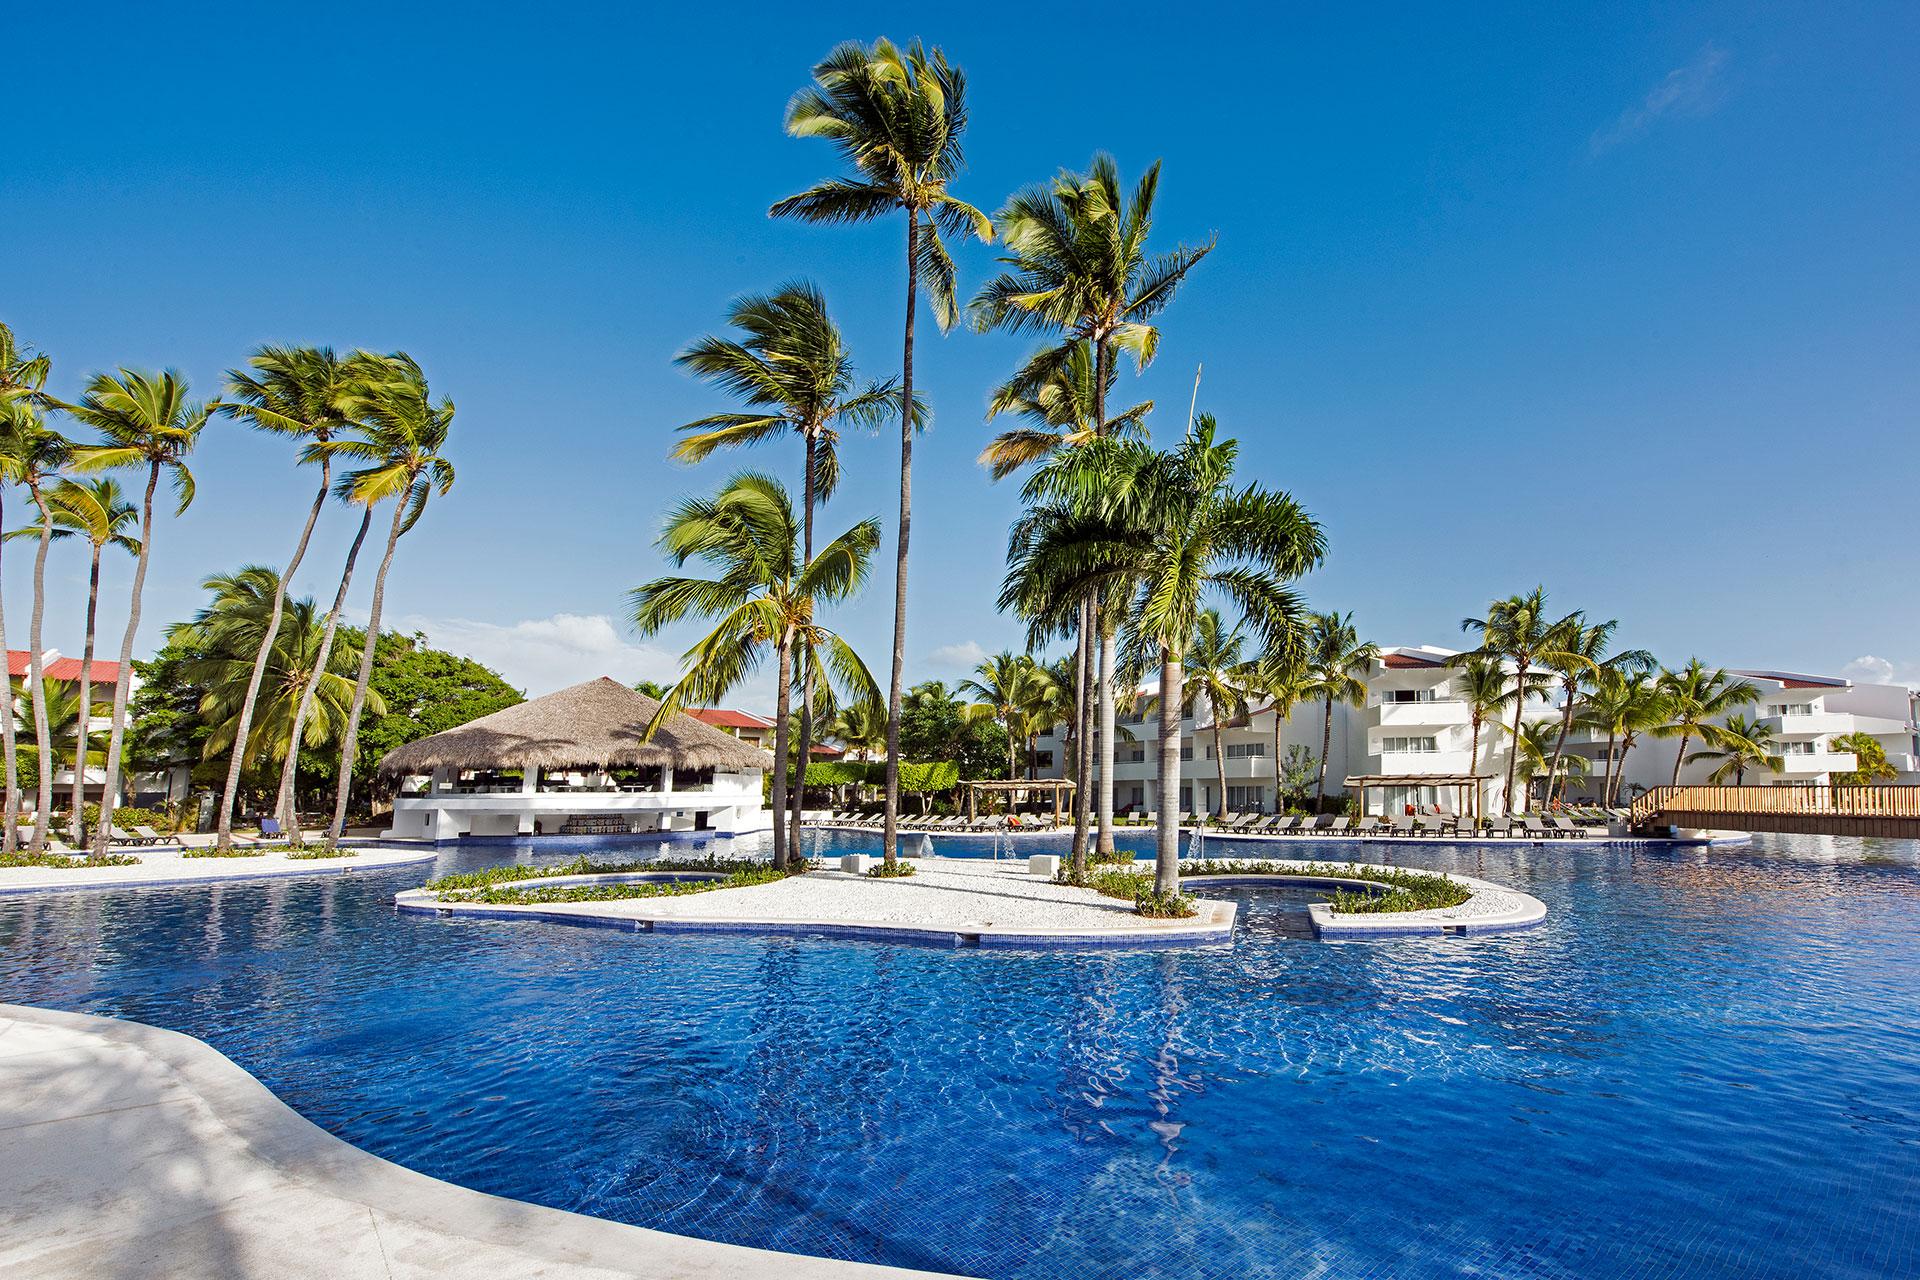 Occidental Punta Cana; Courtesy of Occidental Punta Cana